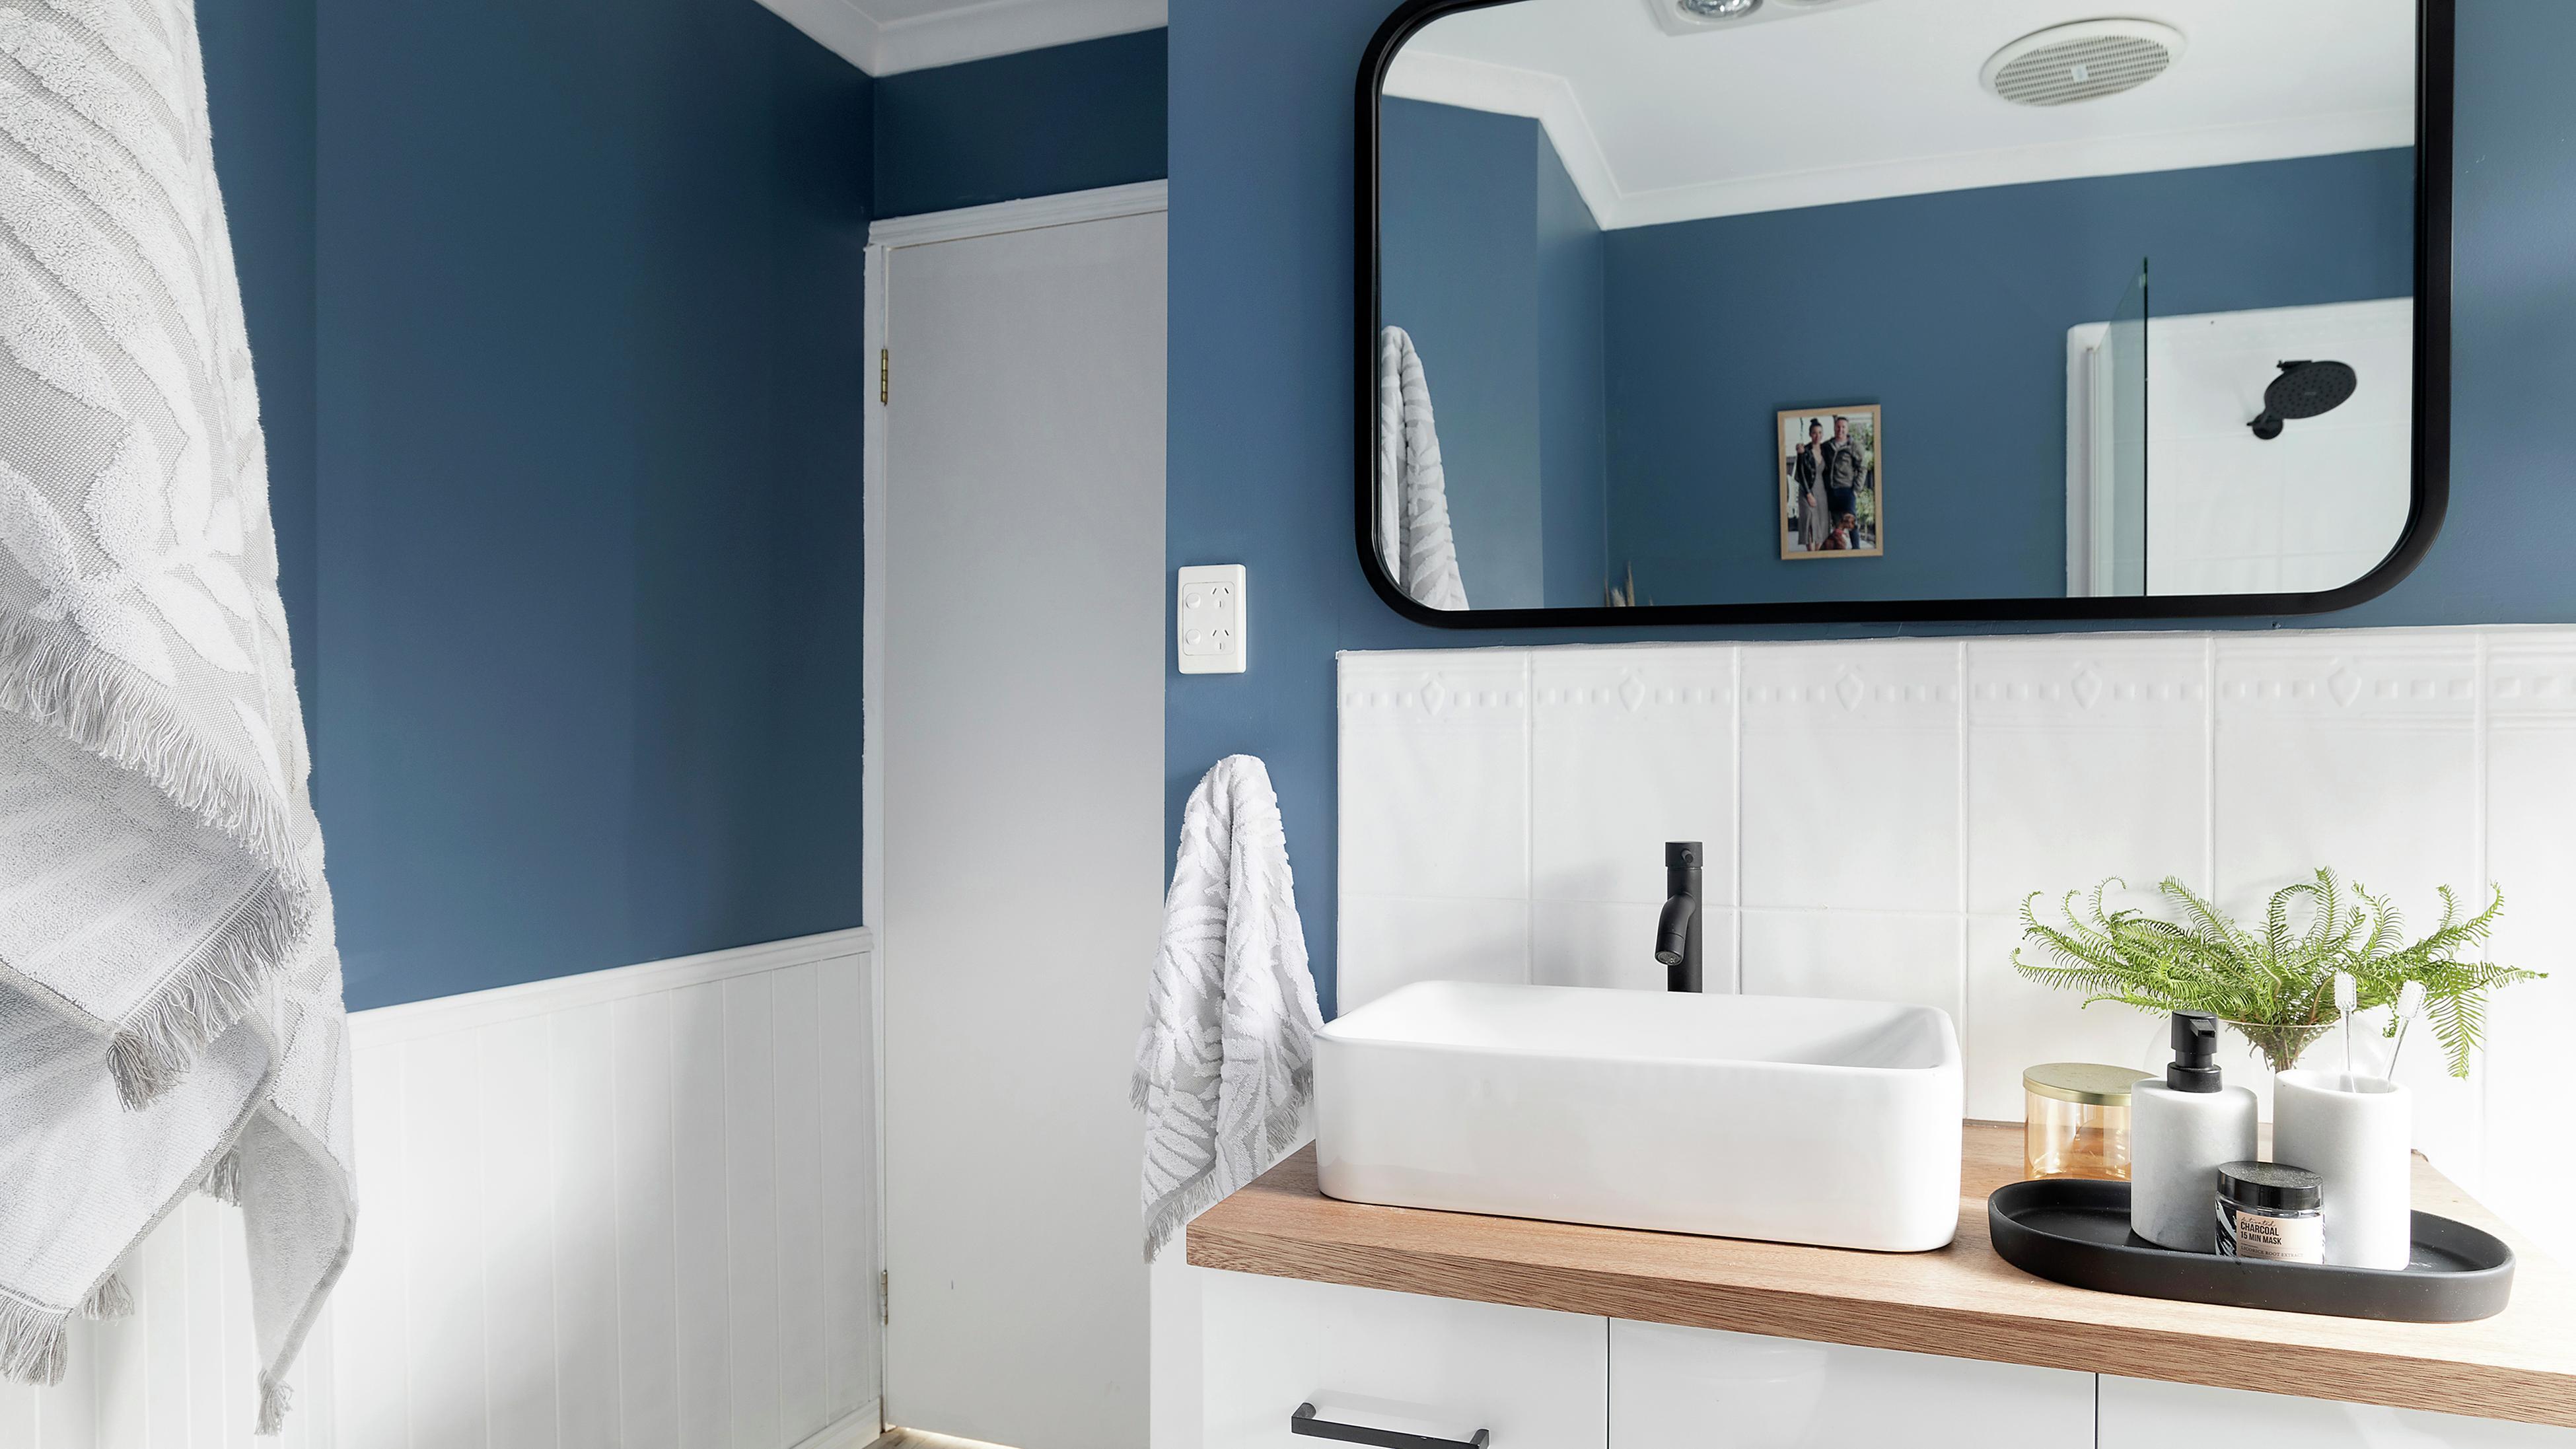 Bathroom with blue walls featuring vanity, mirror, towels.